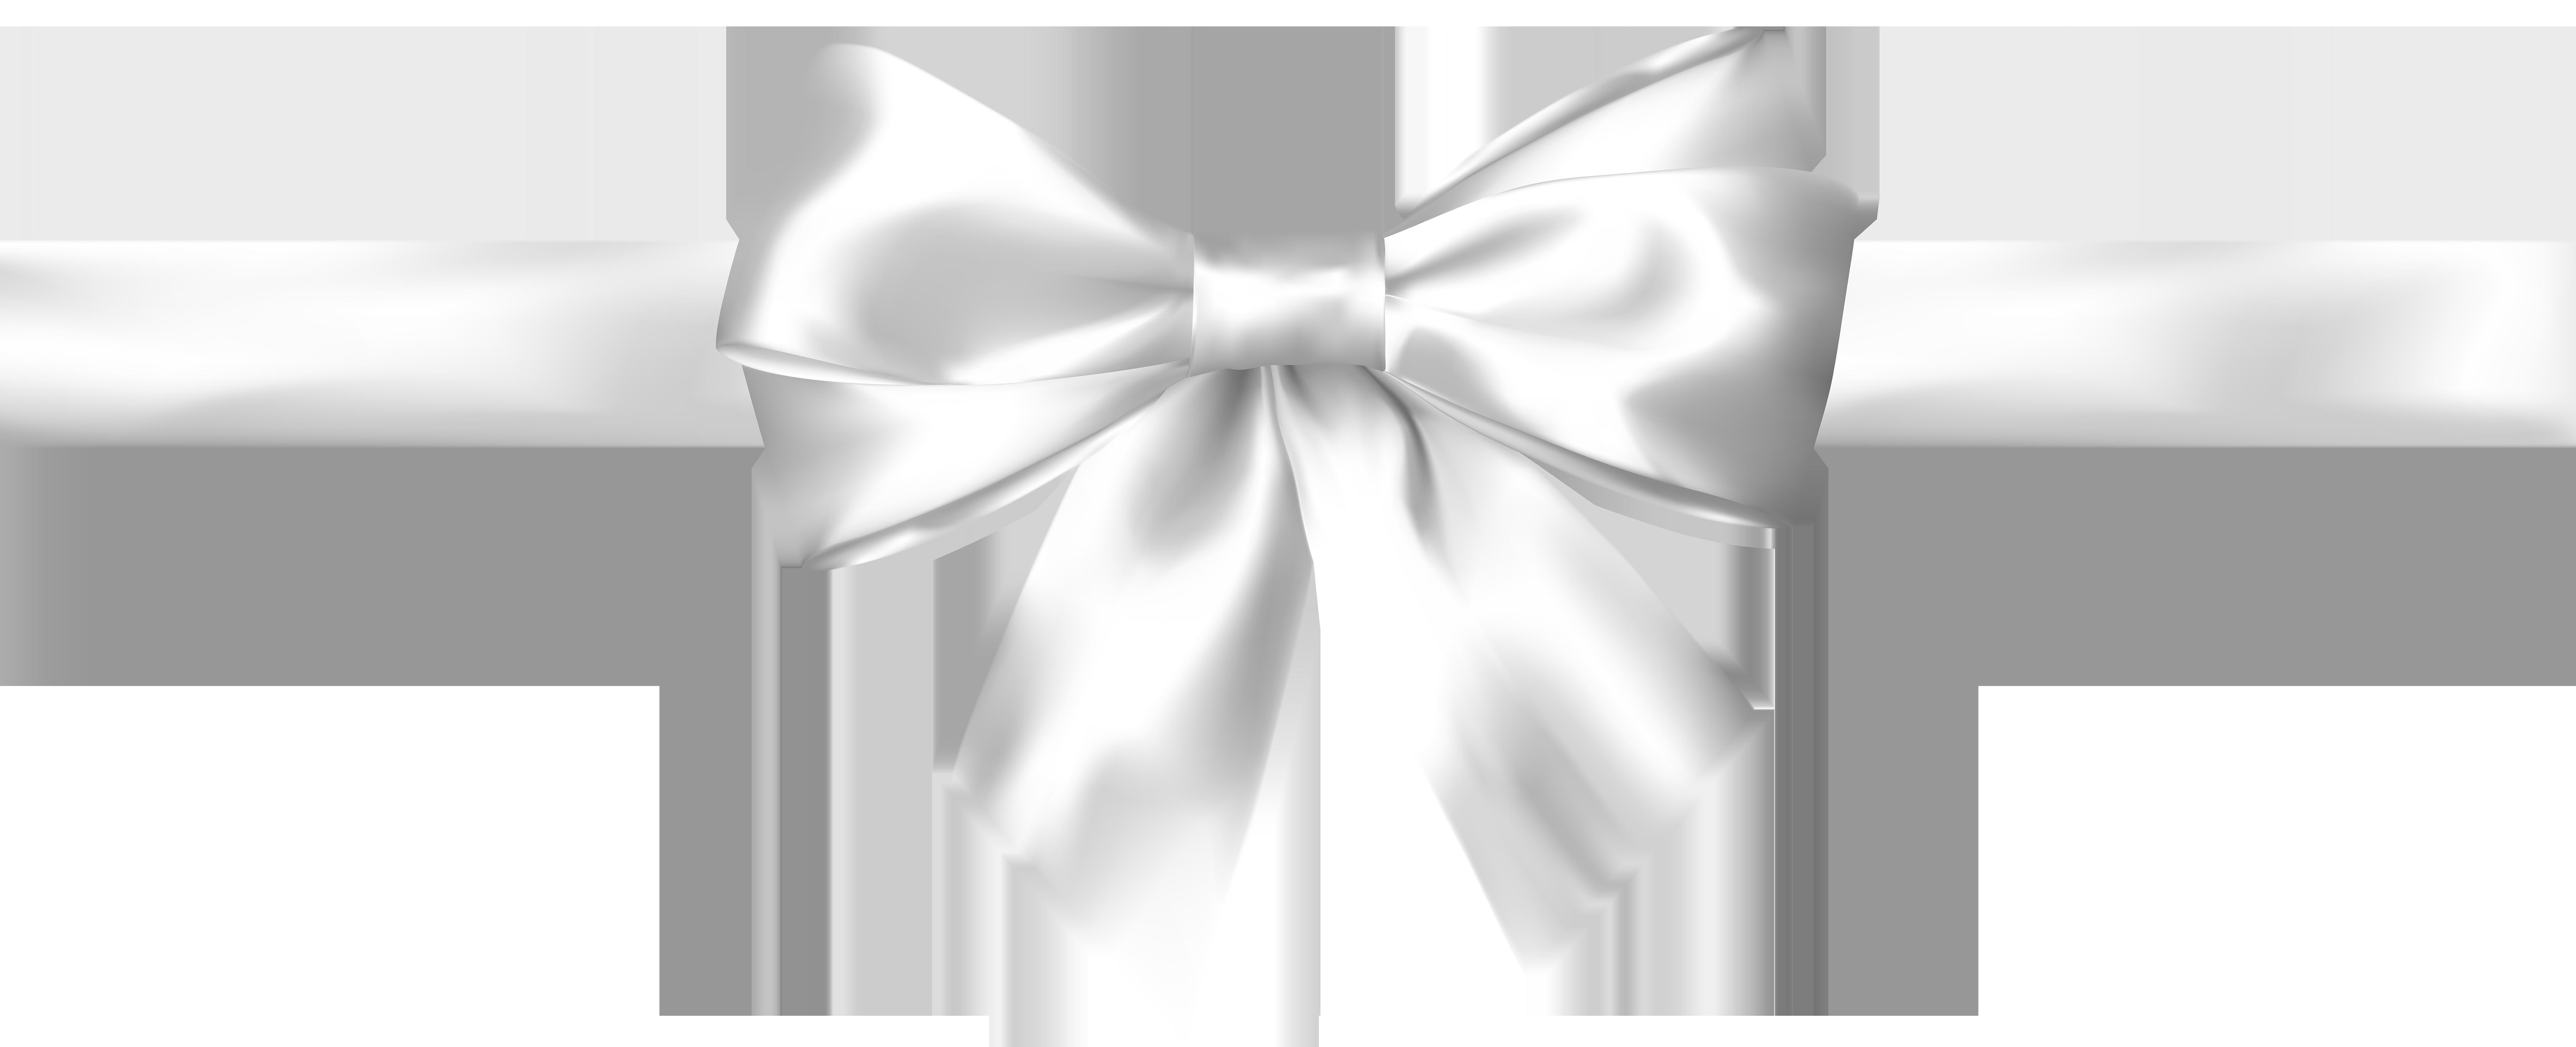 White Bow Transparent PNG Clip Art Image.